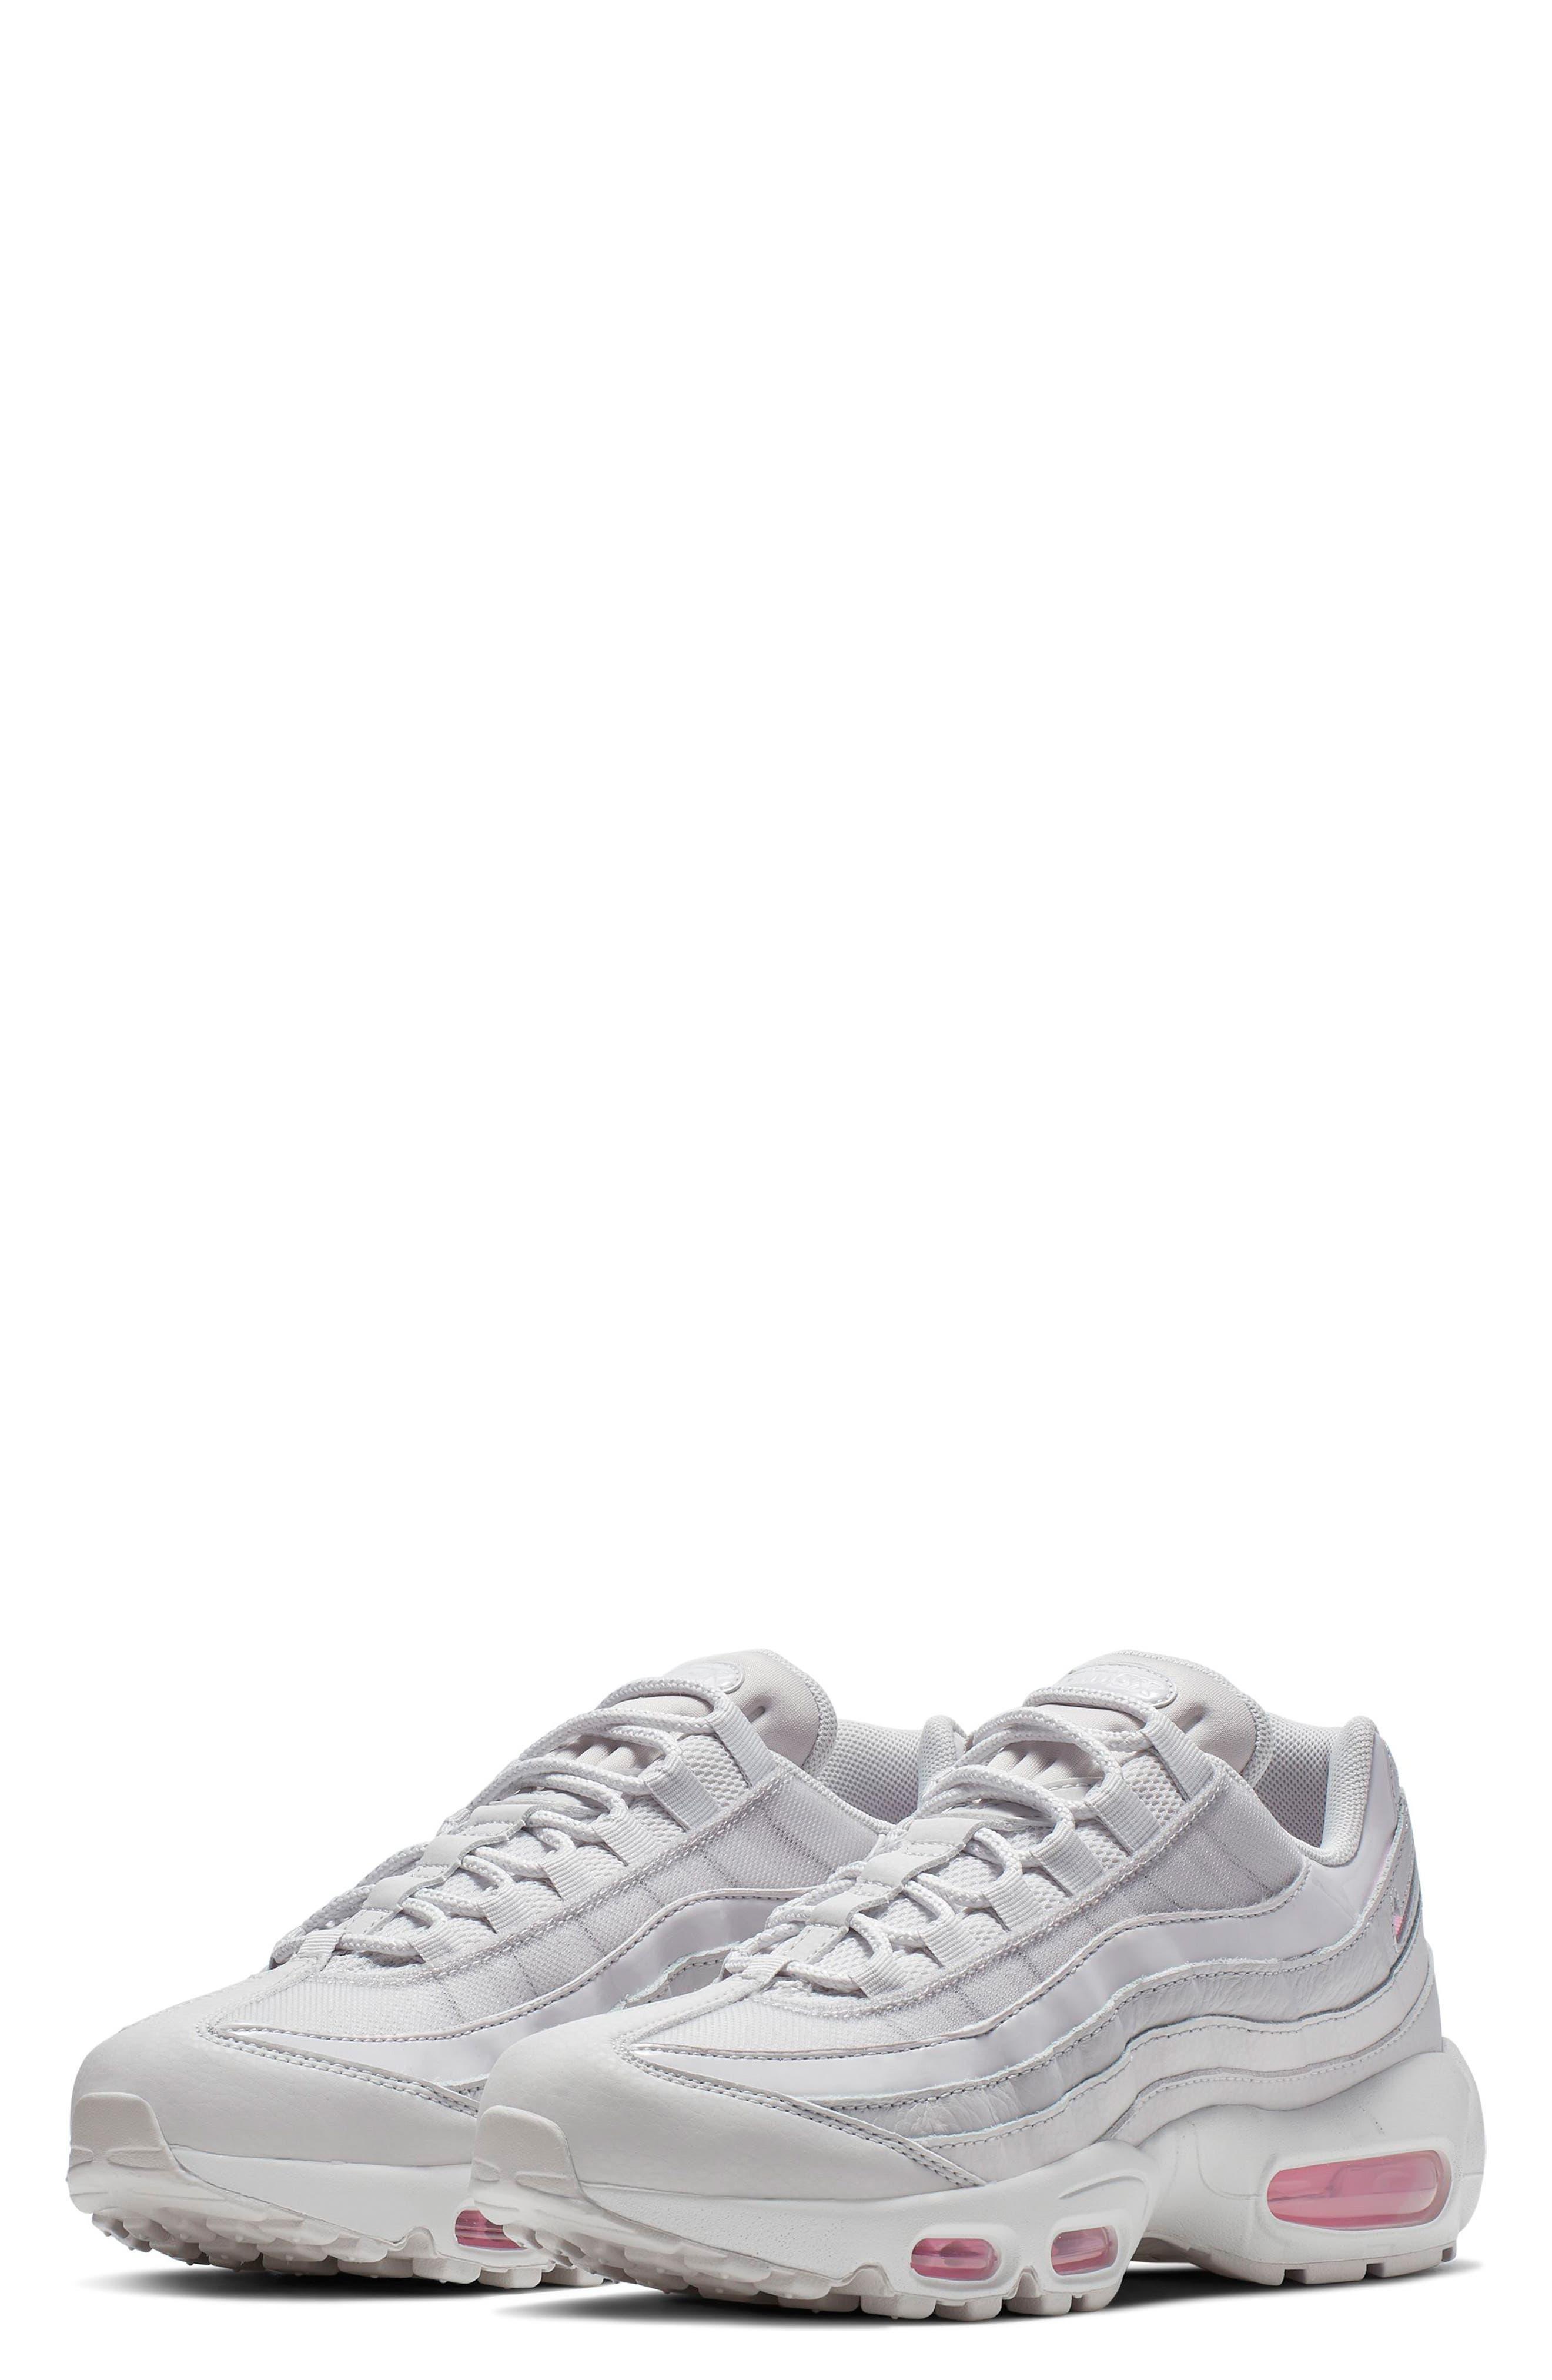 2fa6fccc2b NIKE   Women's Nike Air Max 95 Se Running Shoe,11 M - Grey